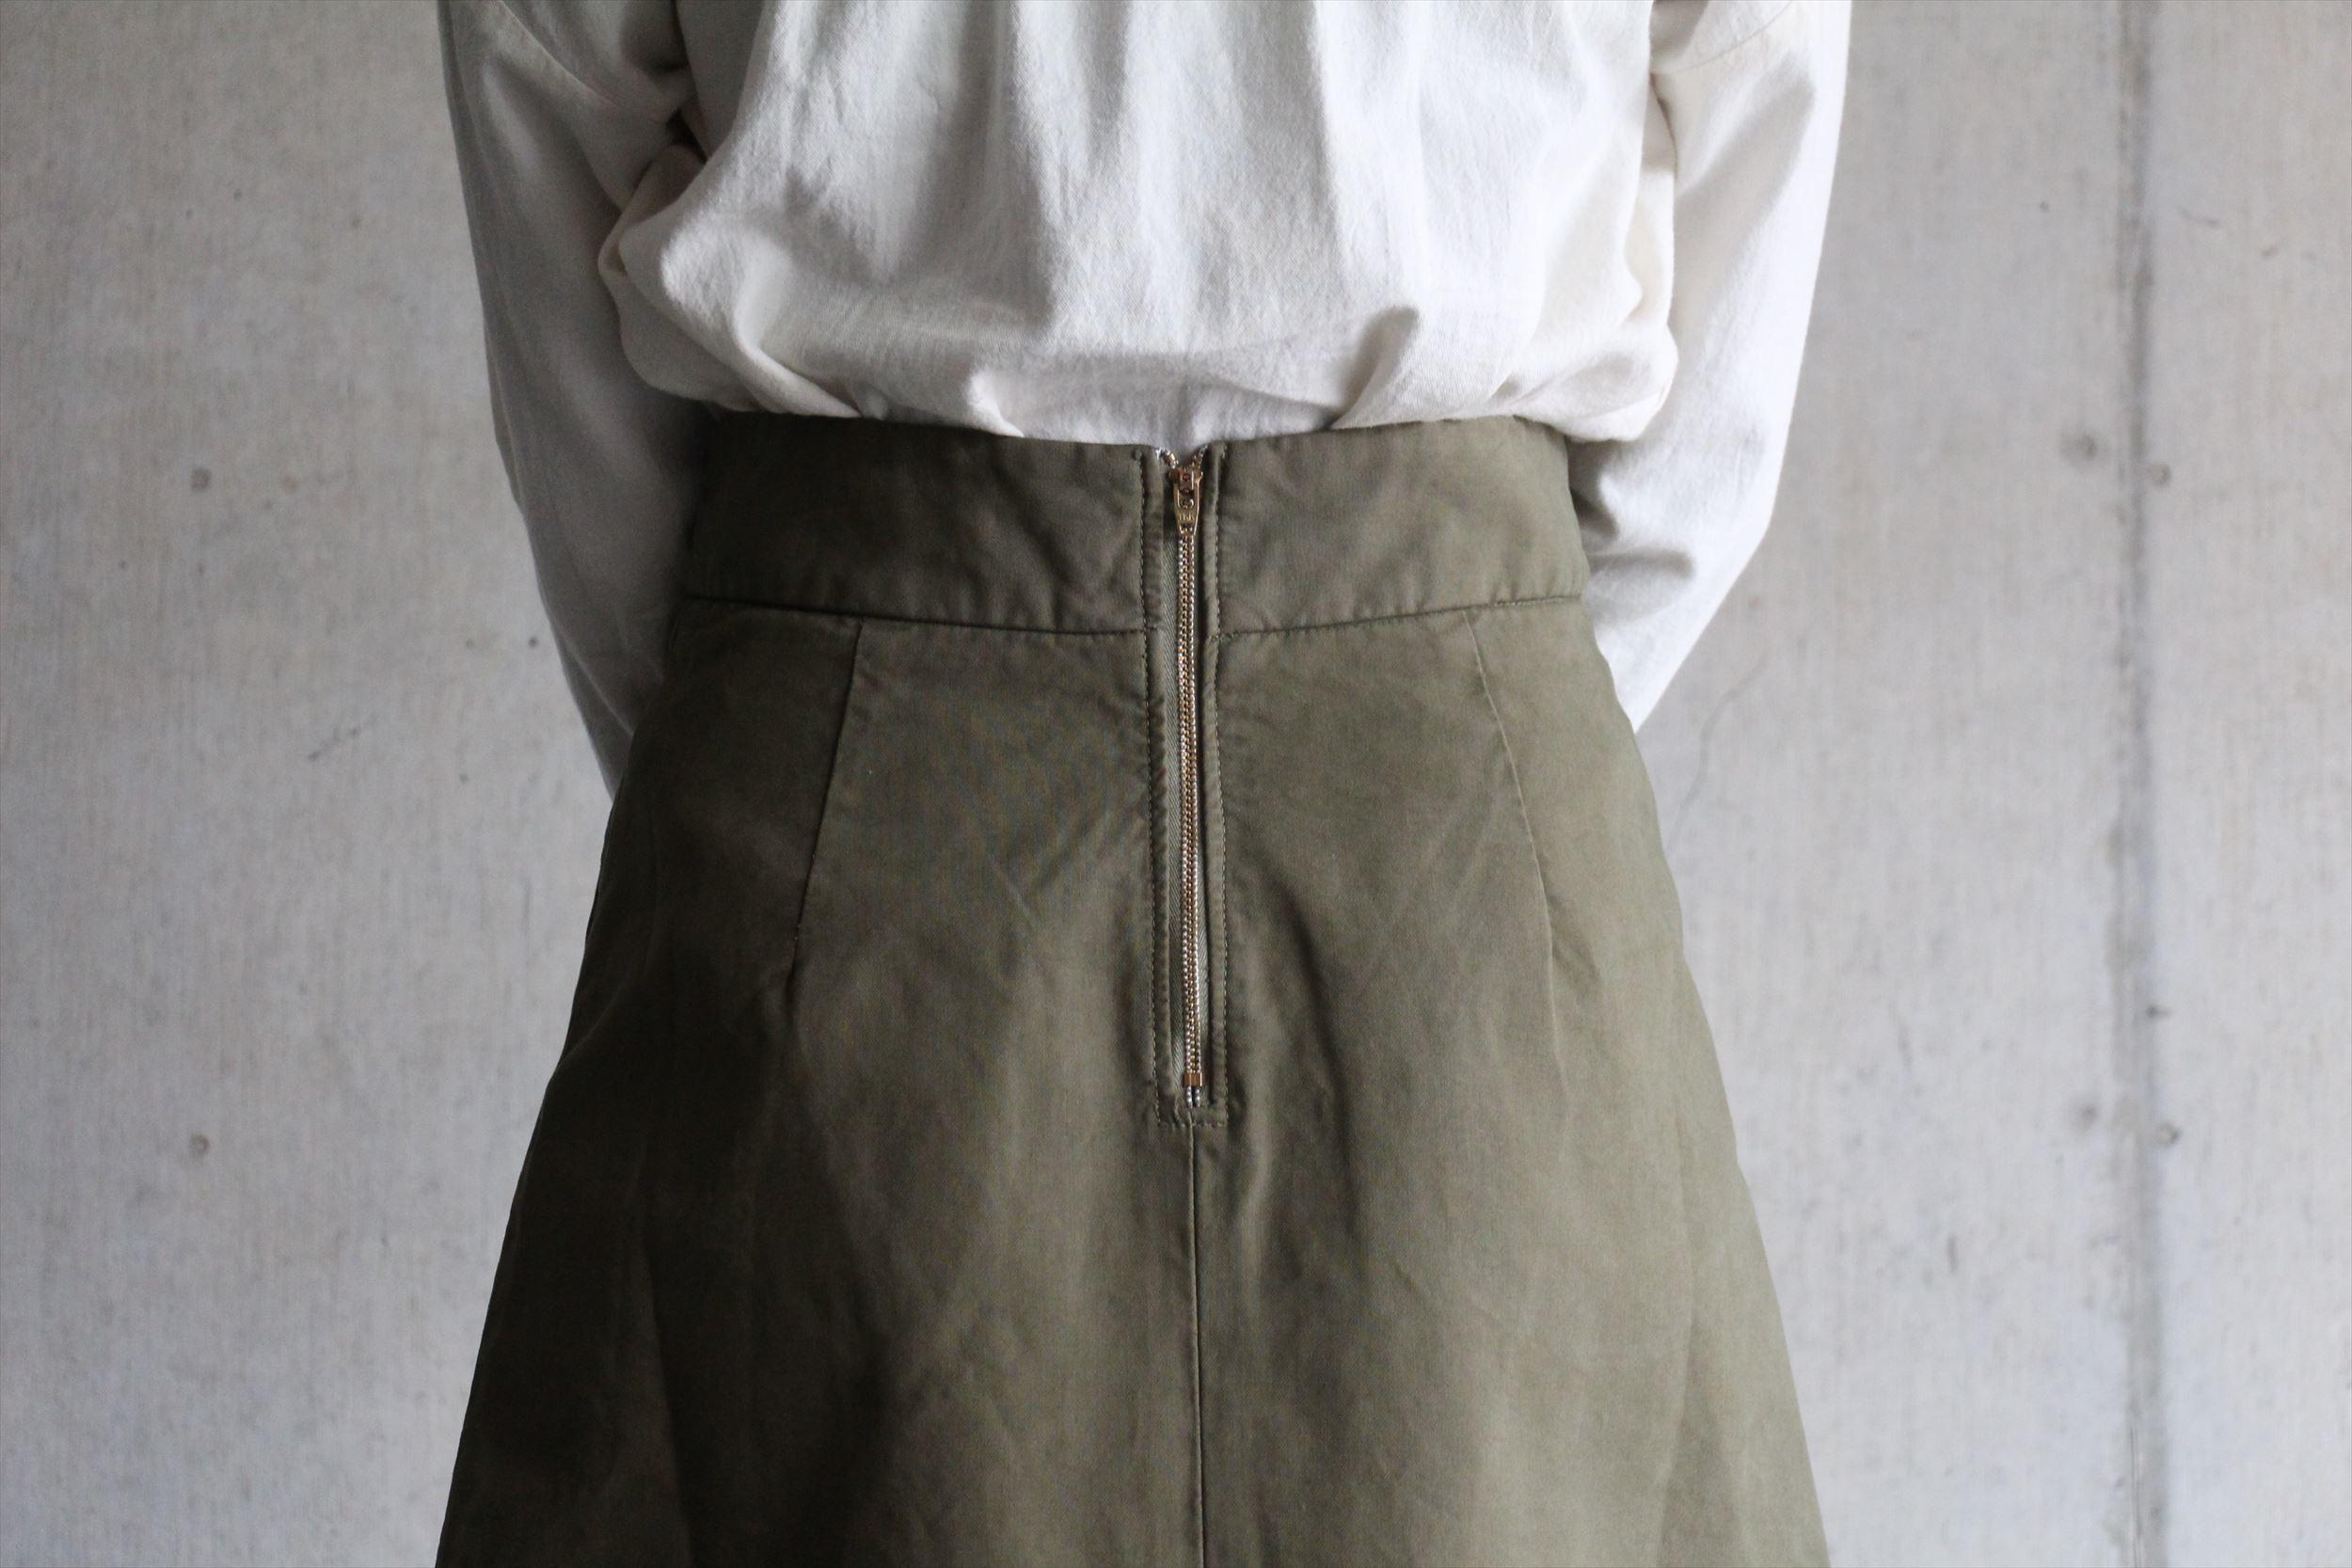 2wayボタンシャツ、ロングスカート_b0165512_17245300.jpg